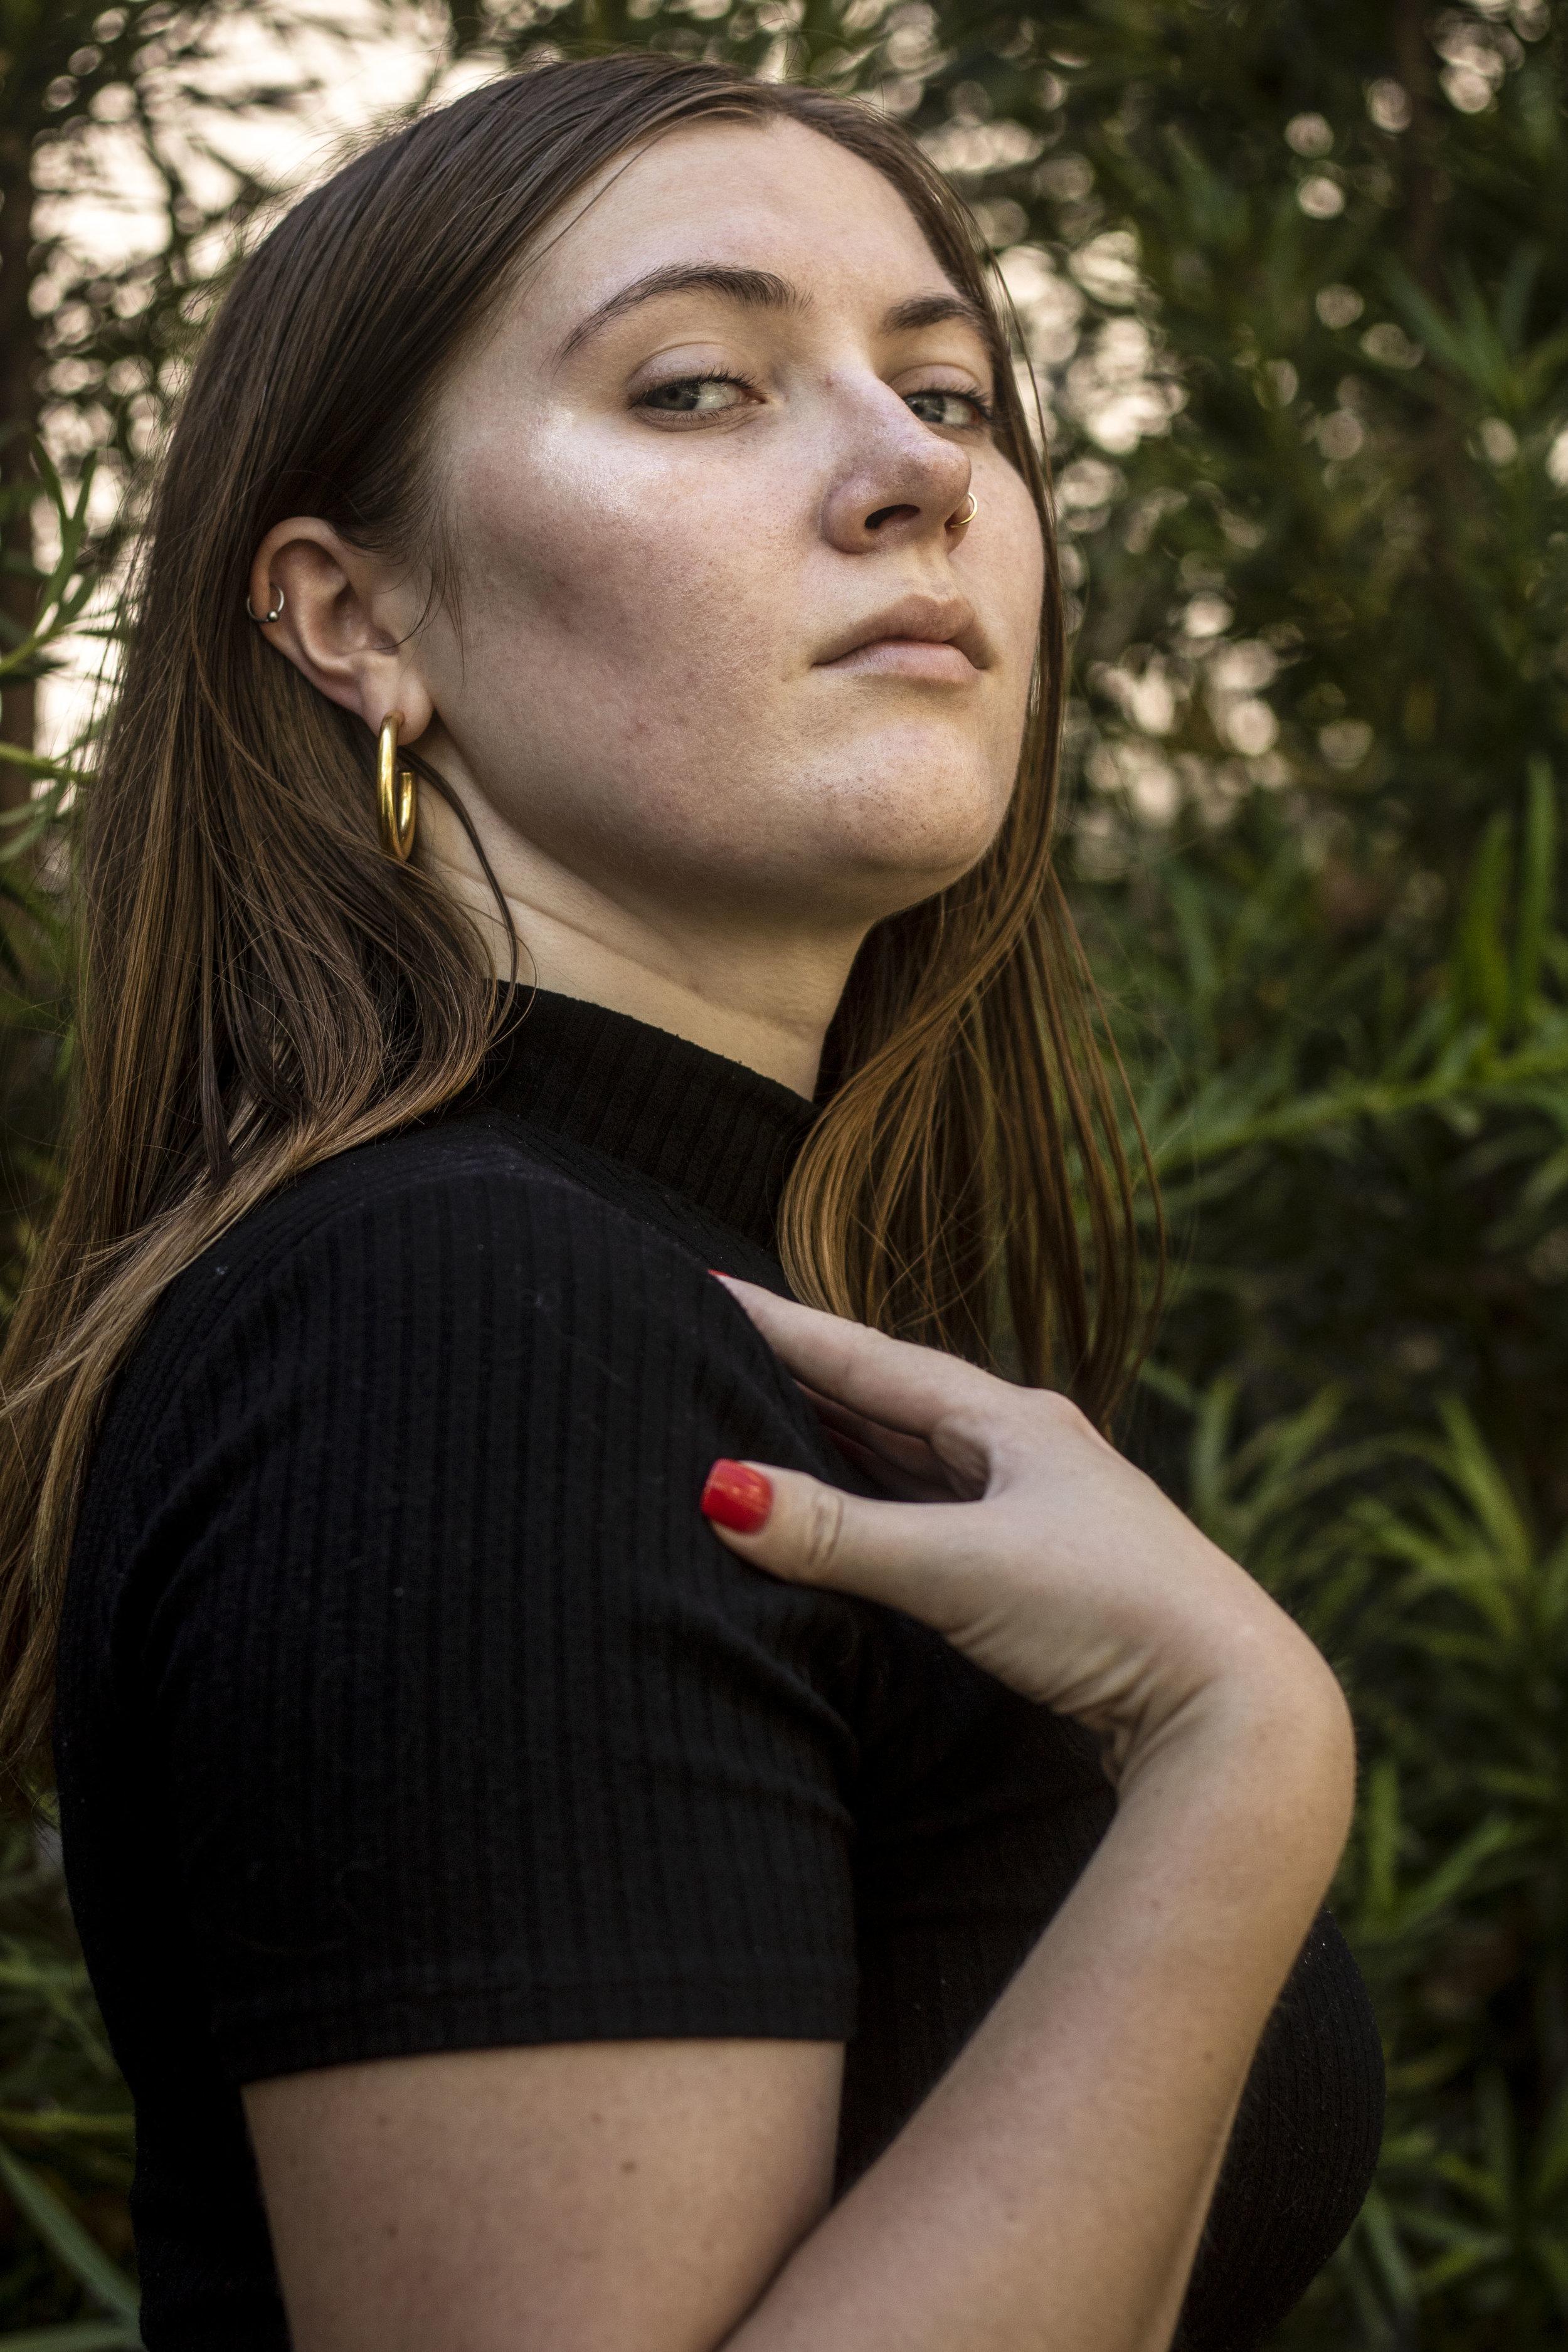 Savannah Olson is seen wearing a light makeup look.